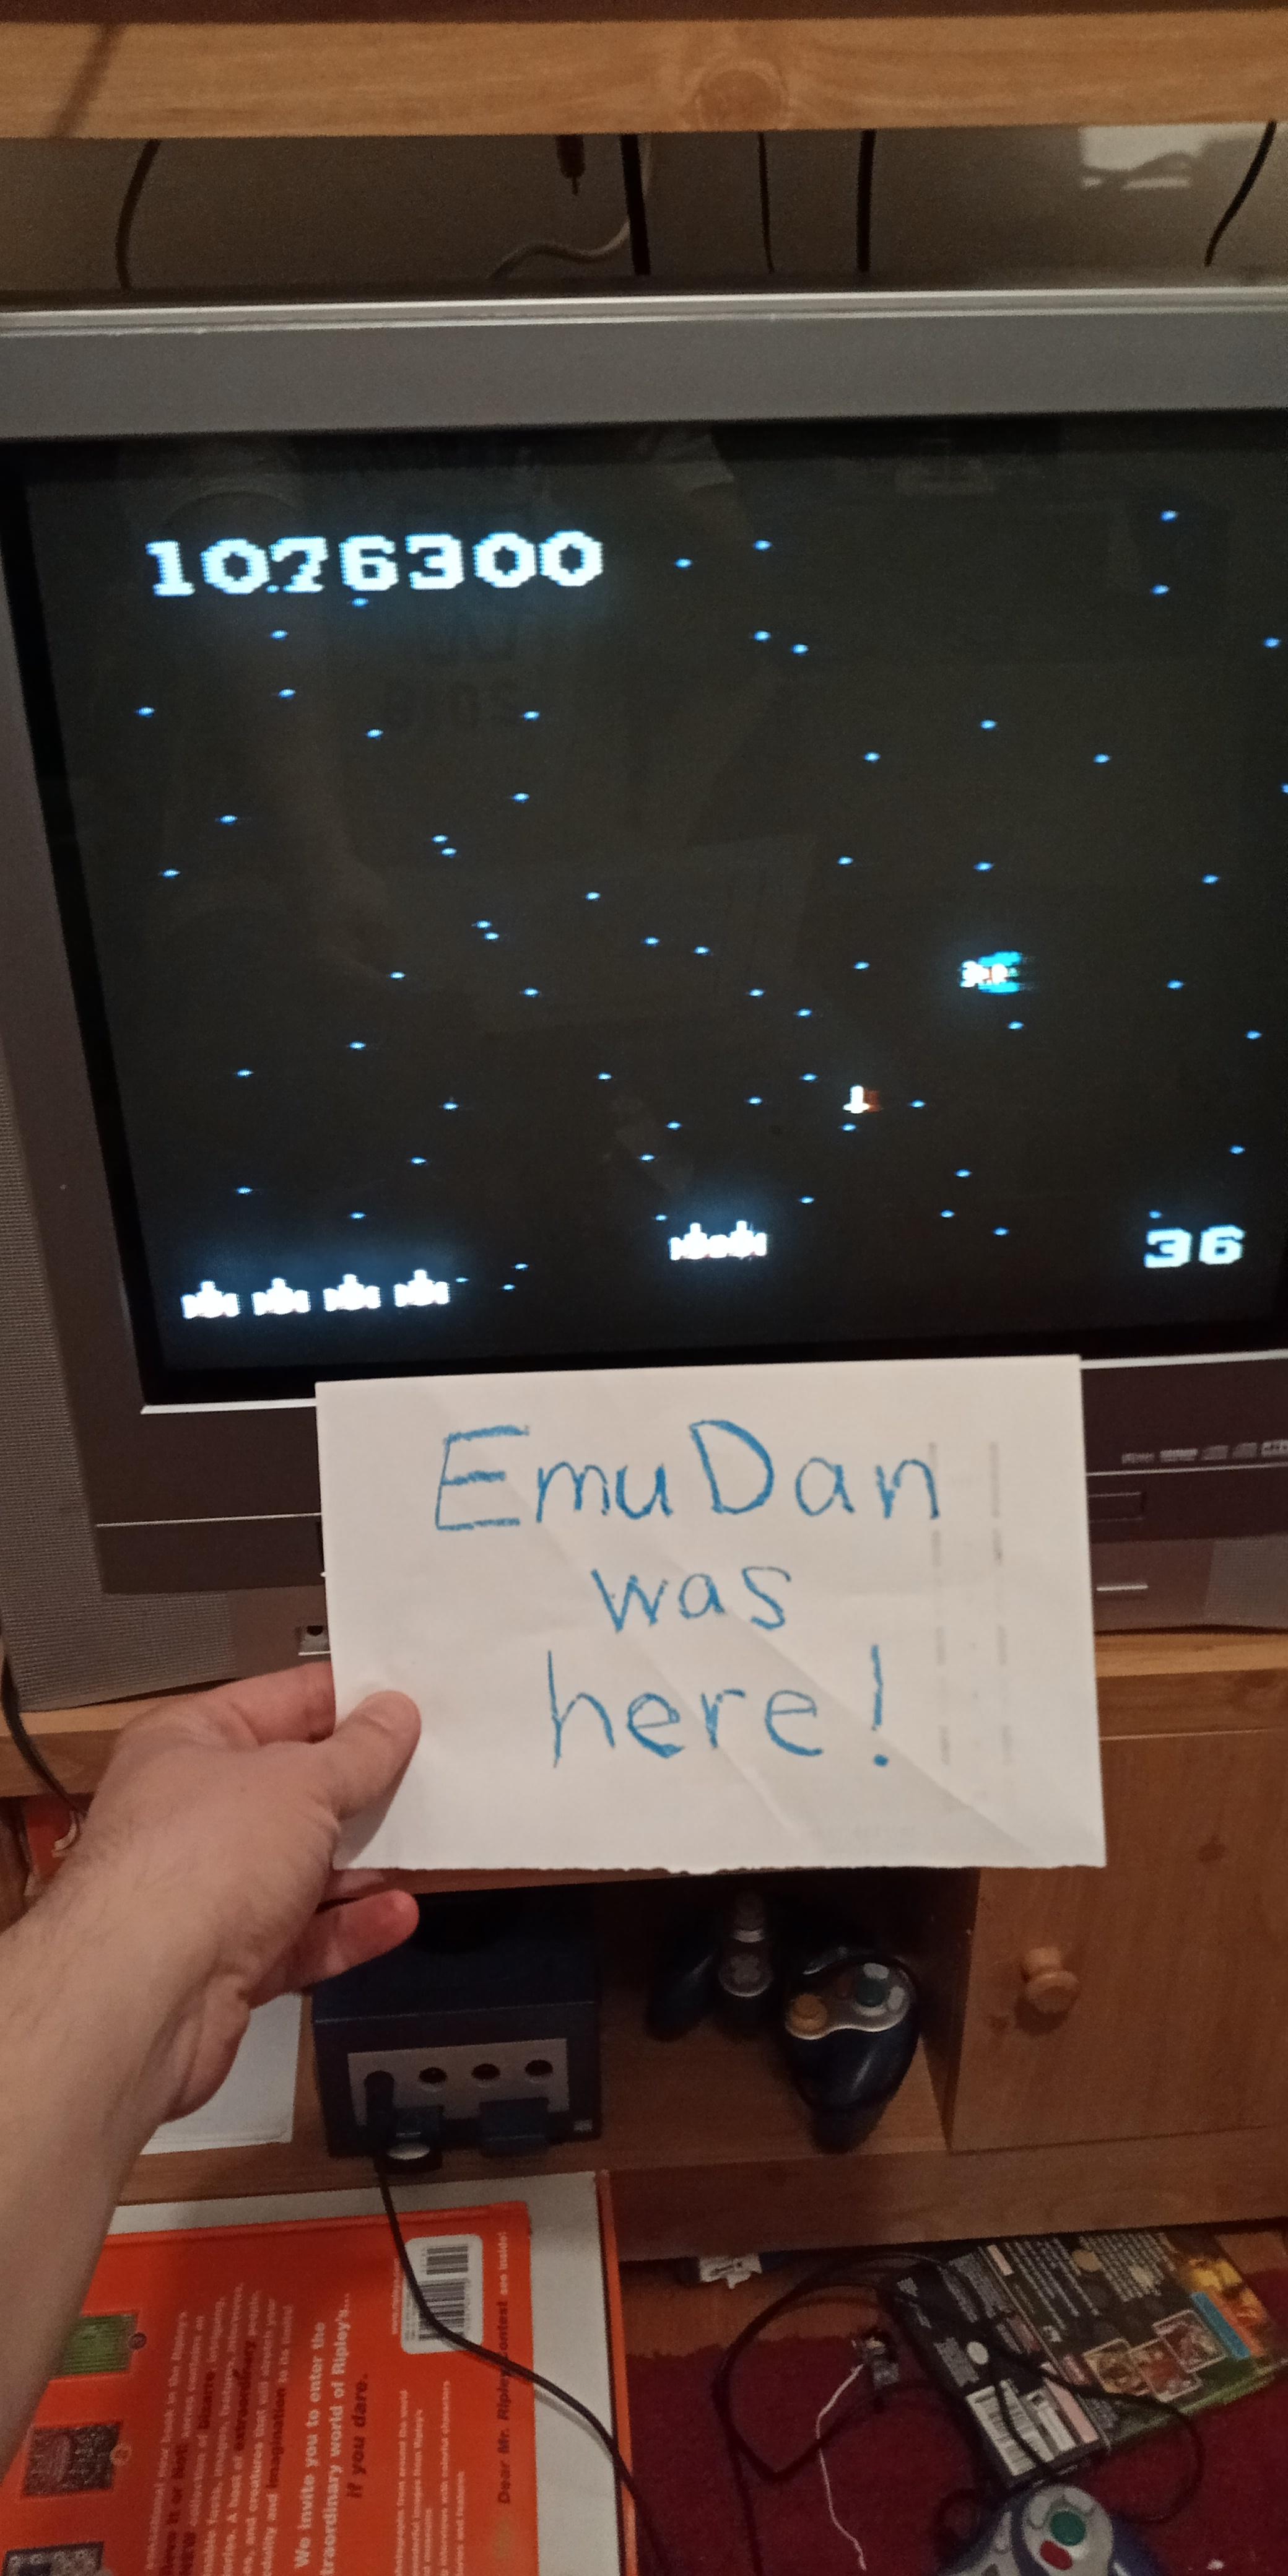 EmuDan: Galaga: Novice (Atari 7800) 1,076,300 points on 2019-05-15 19:25:32